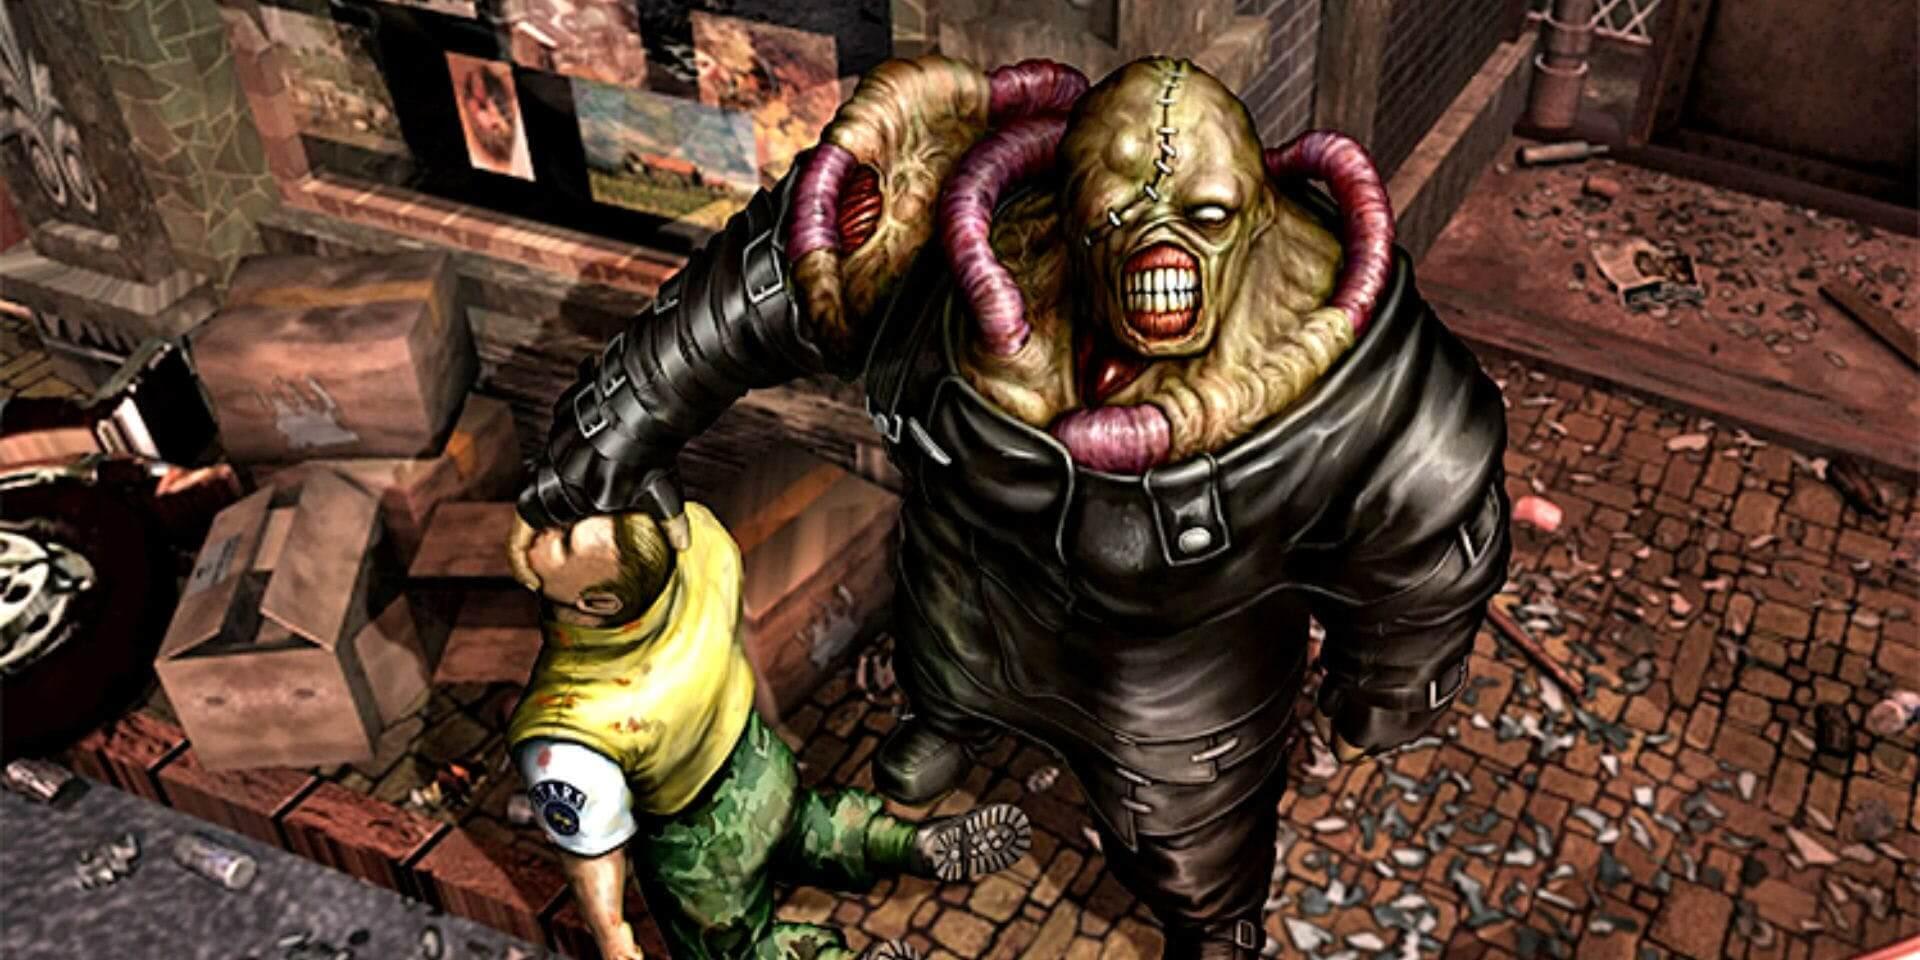 Resident Evil 3 Remake covers have been leaked online - DSOGaming